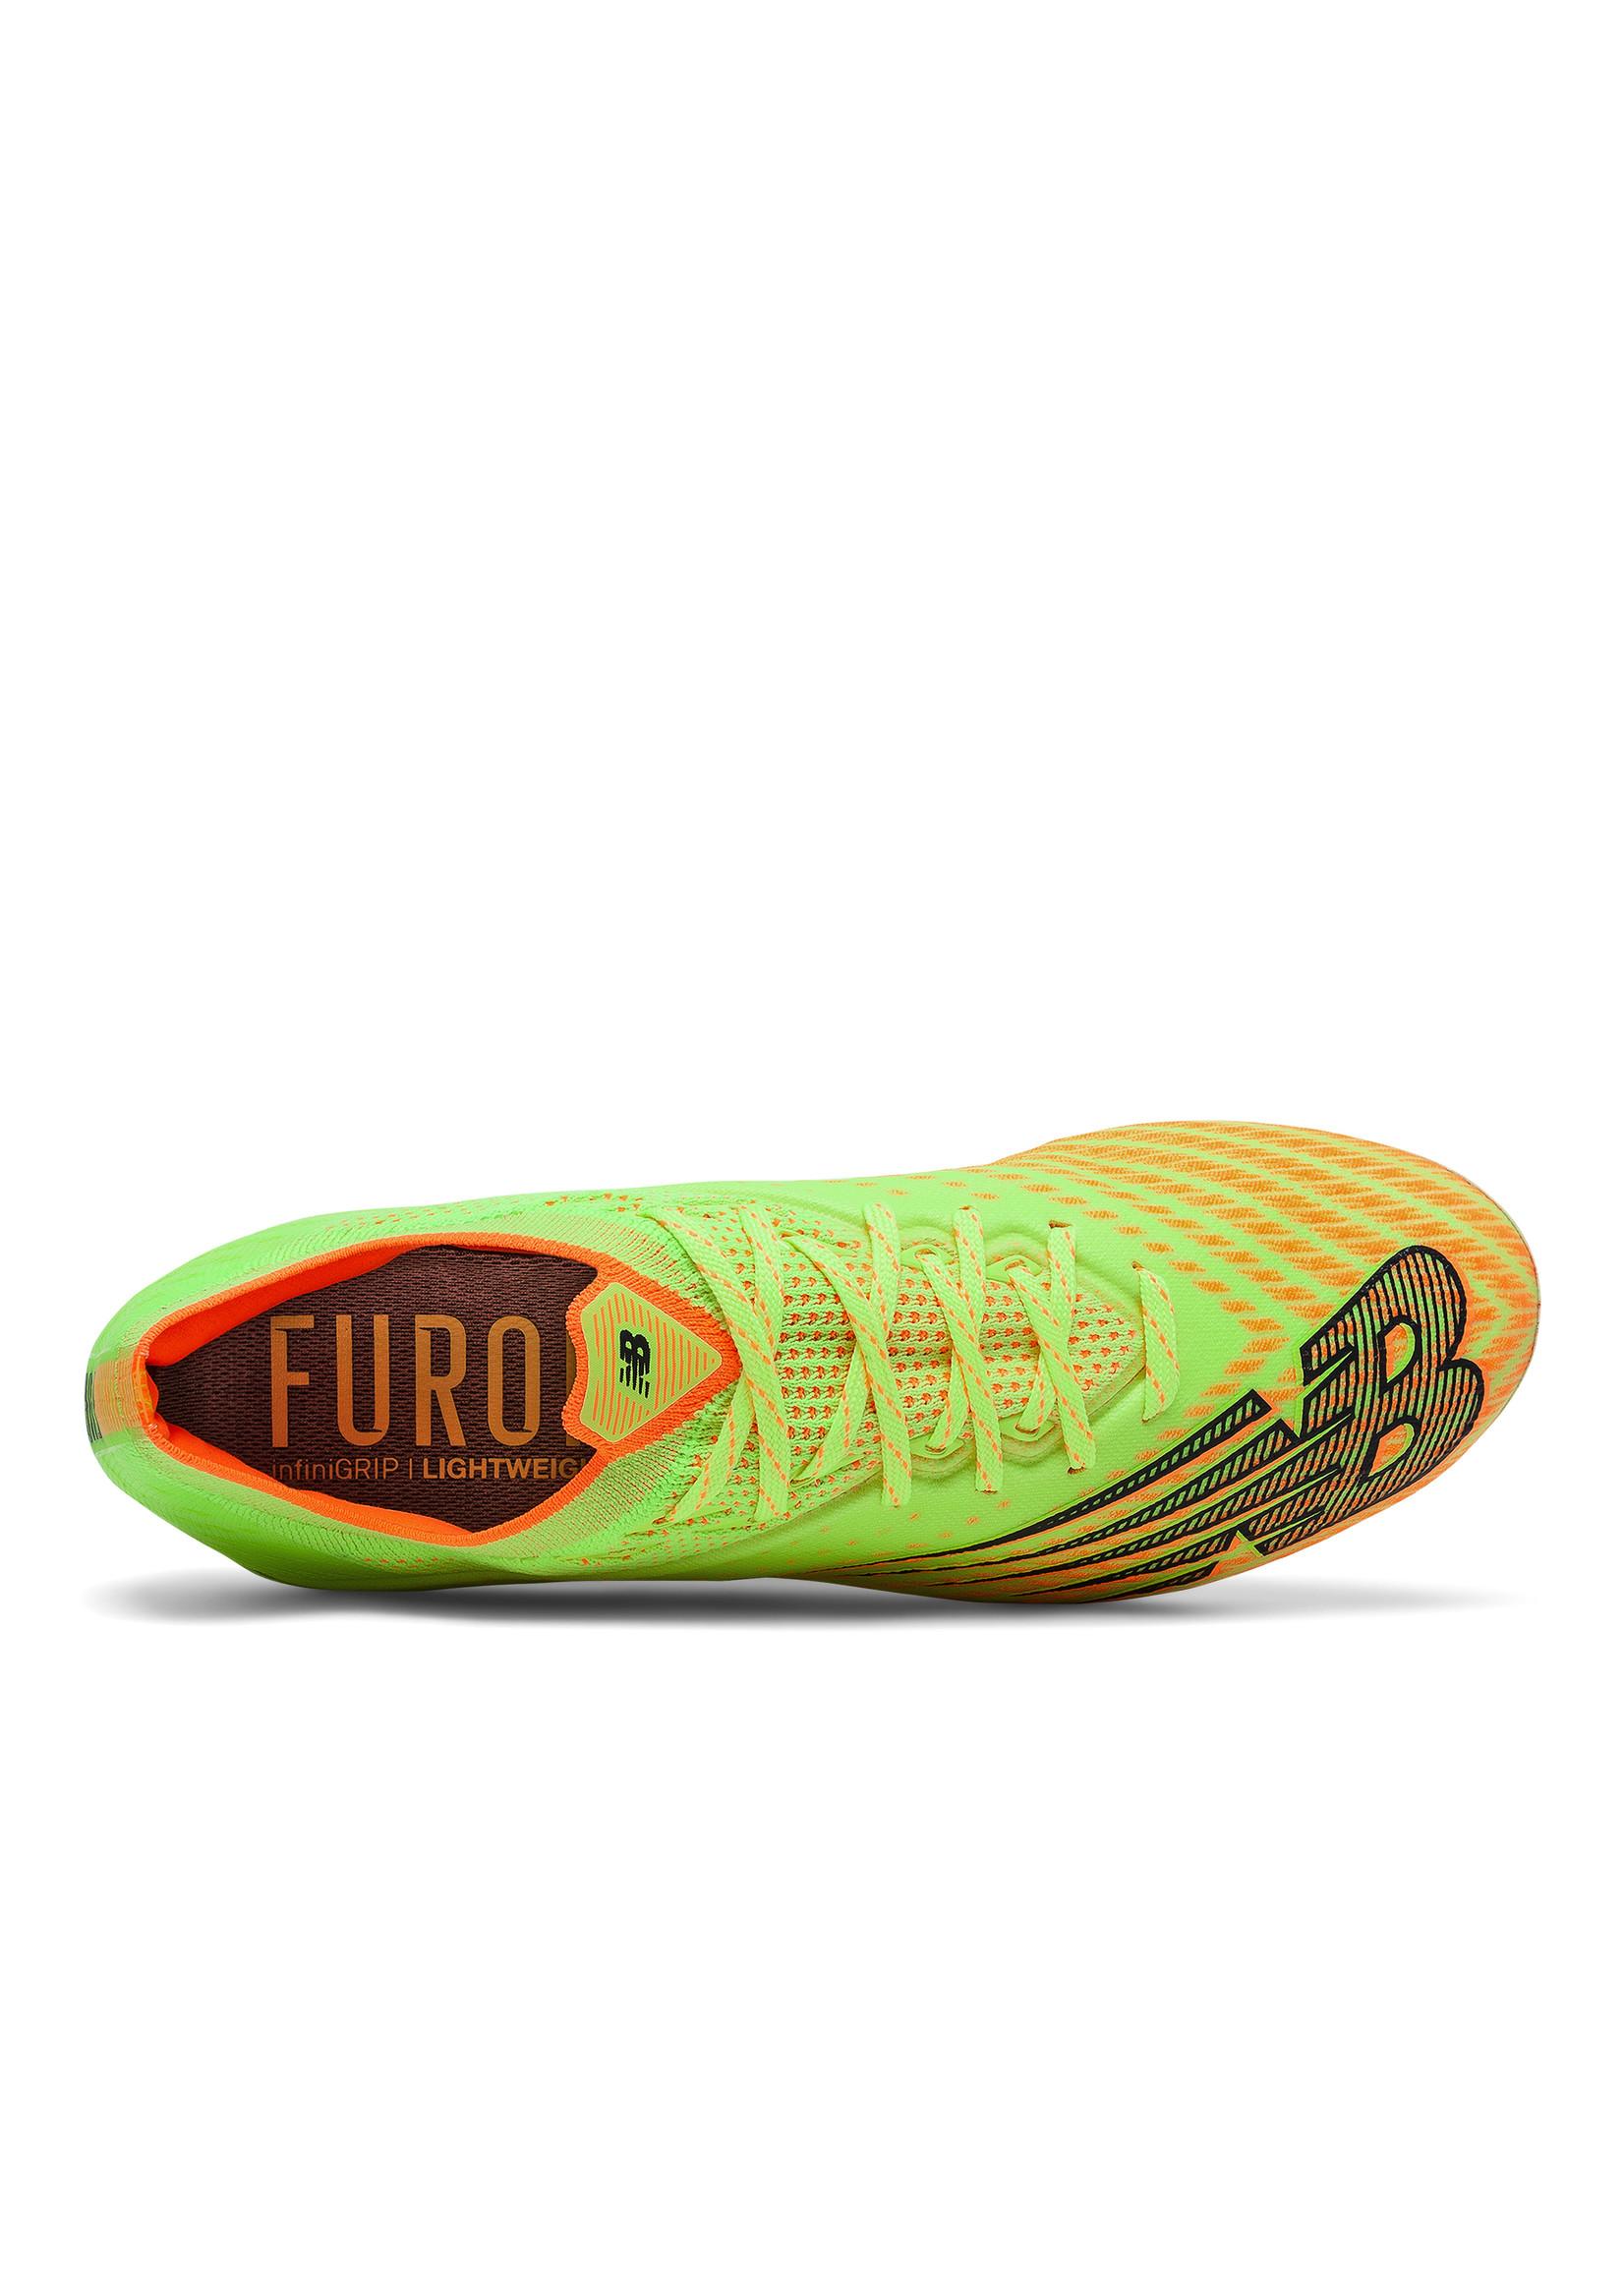 New Balance Furon V6+ Pro FG - Lime